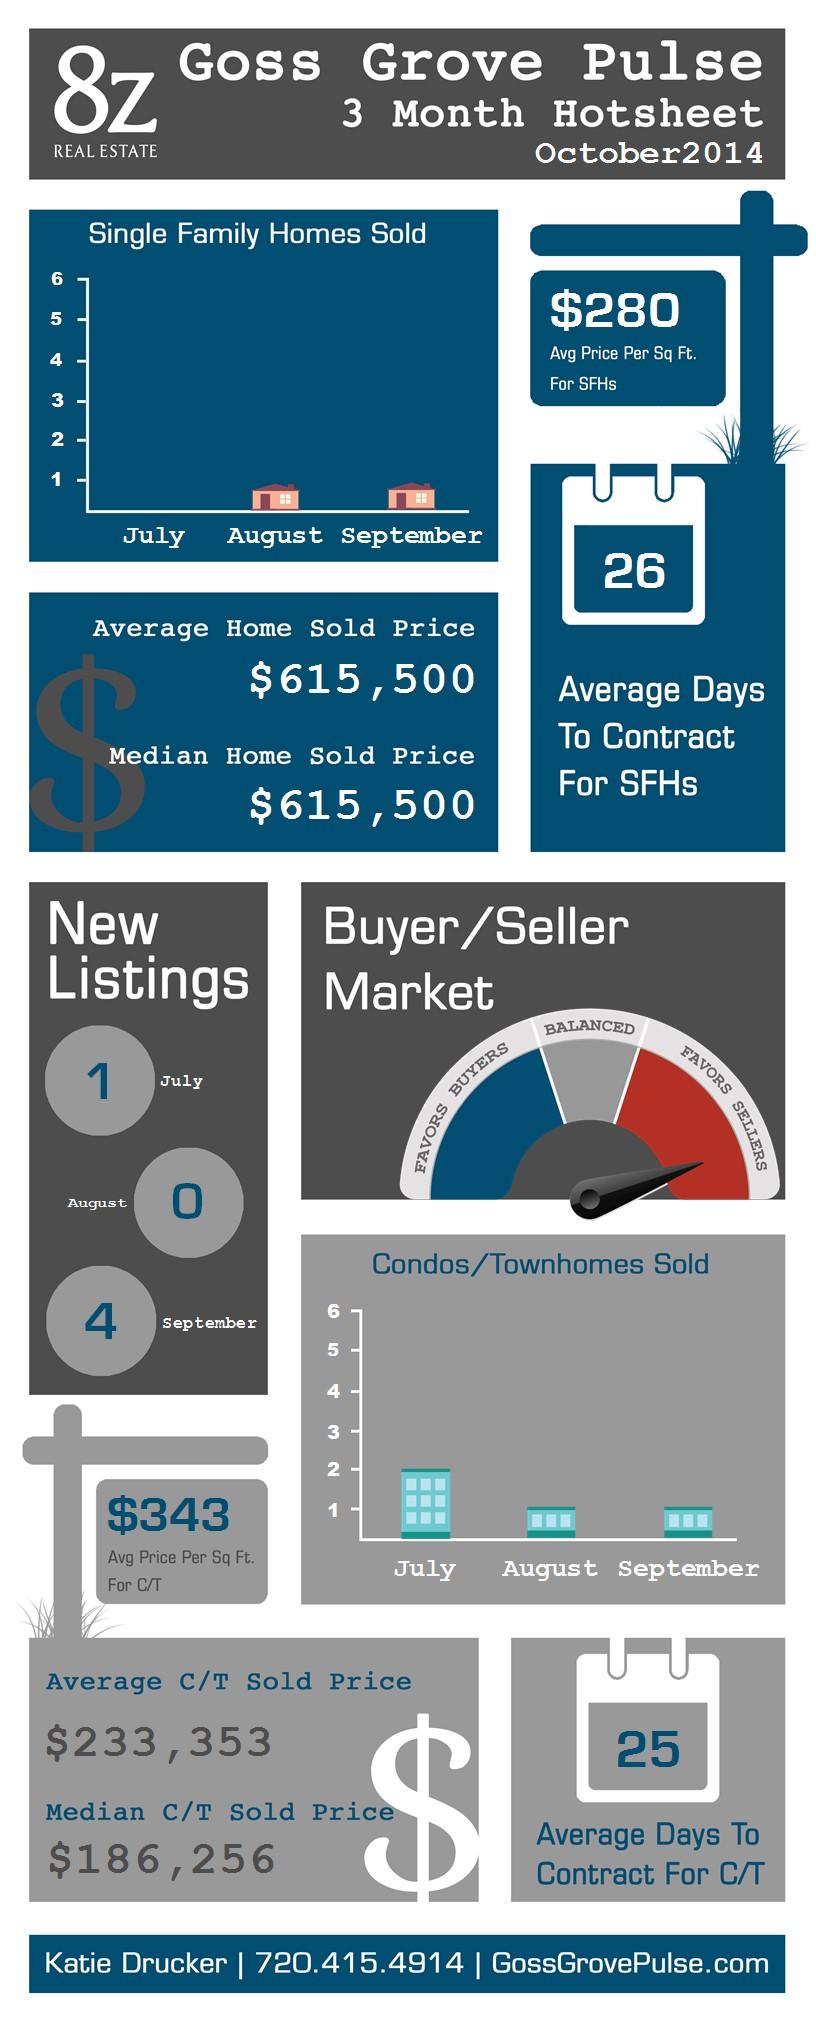 Goss Grove - Boulder, real estate infographic